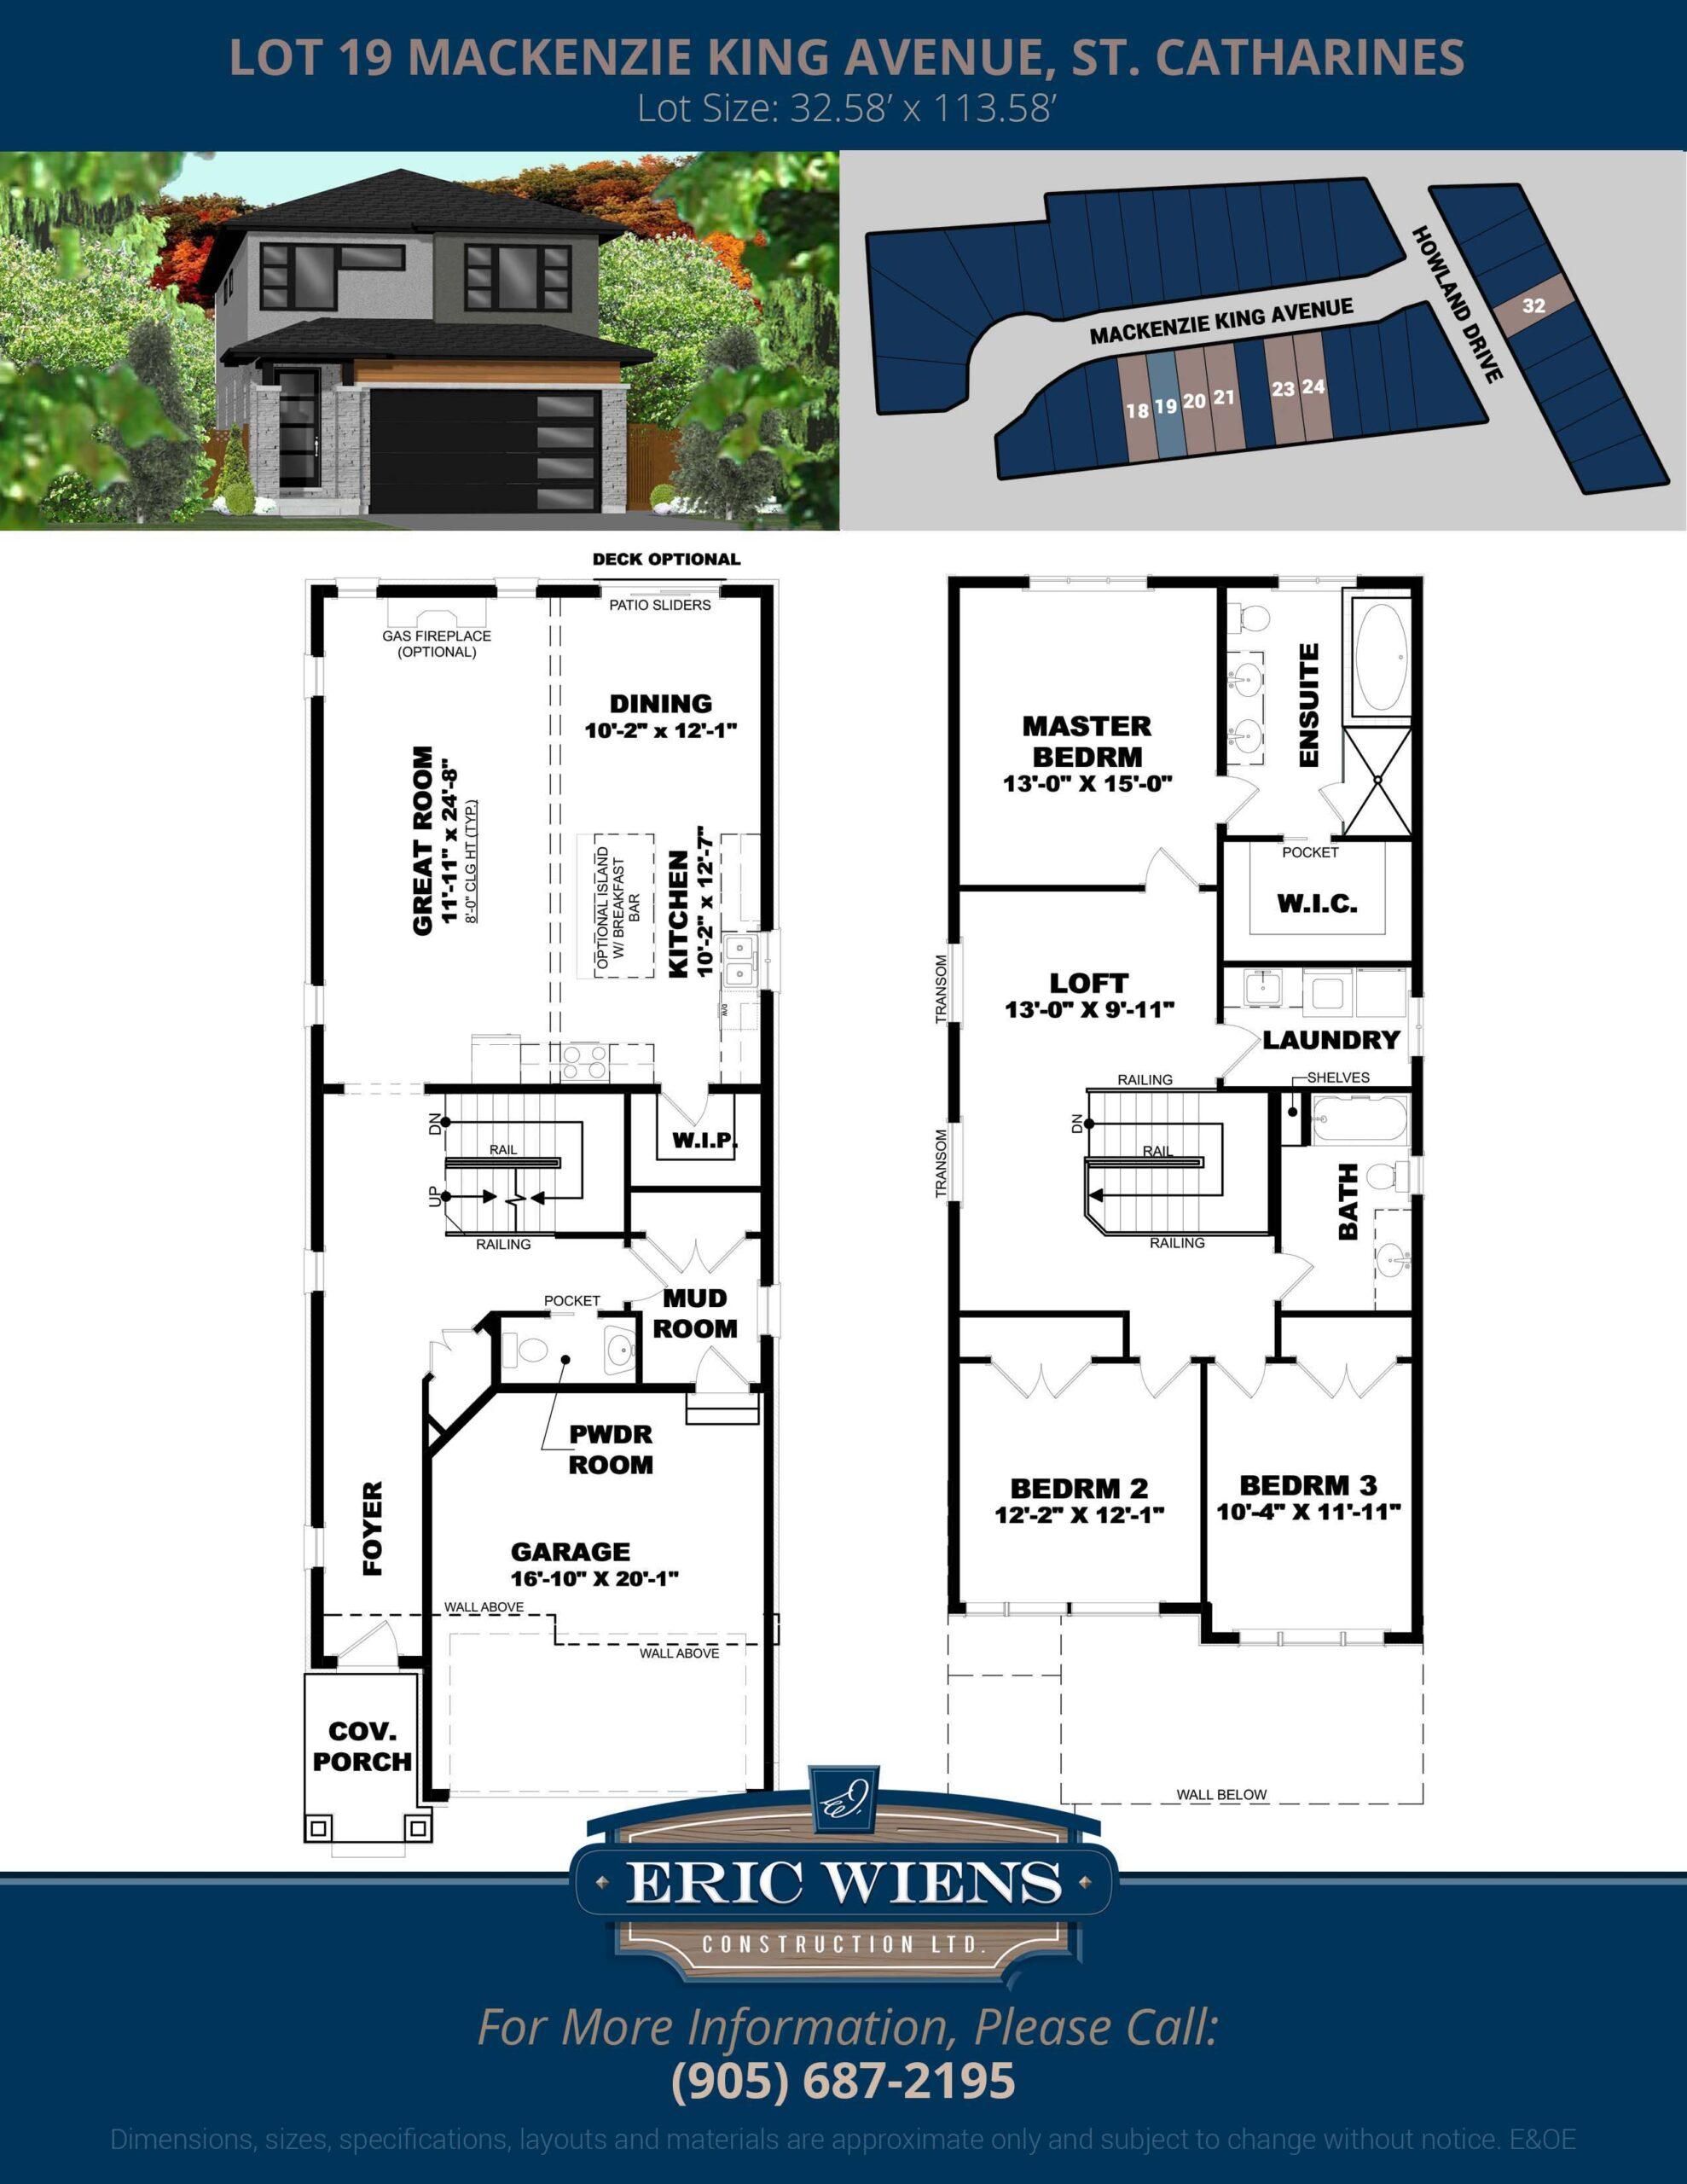 Lot 19 Mackenzie King Avenue Floor Plan